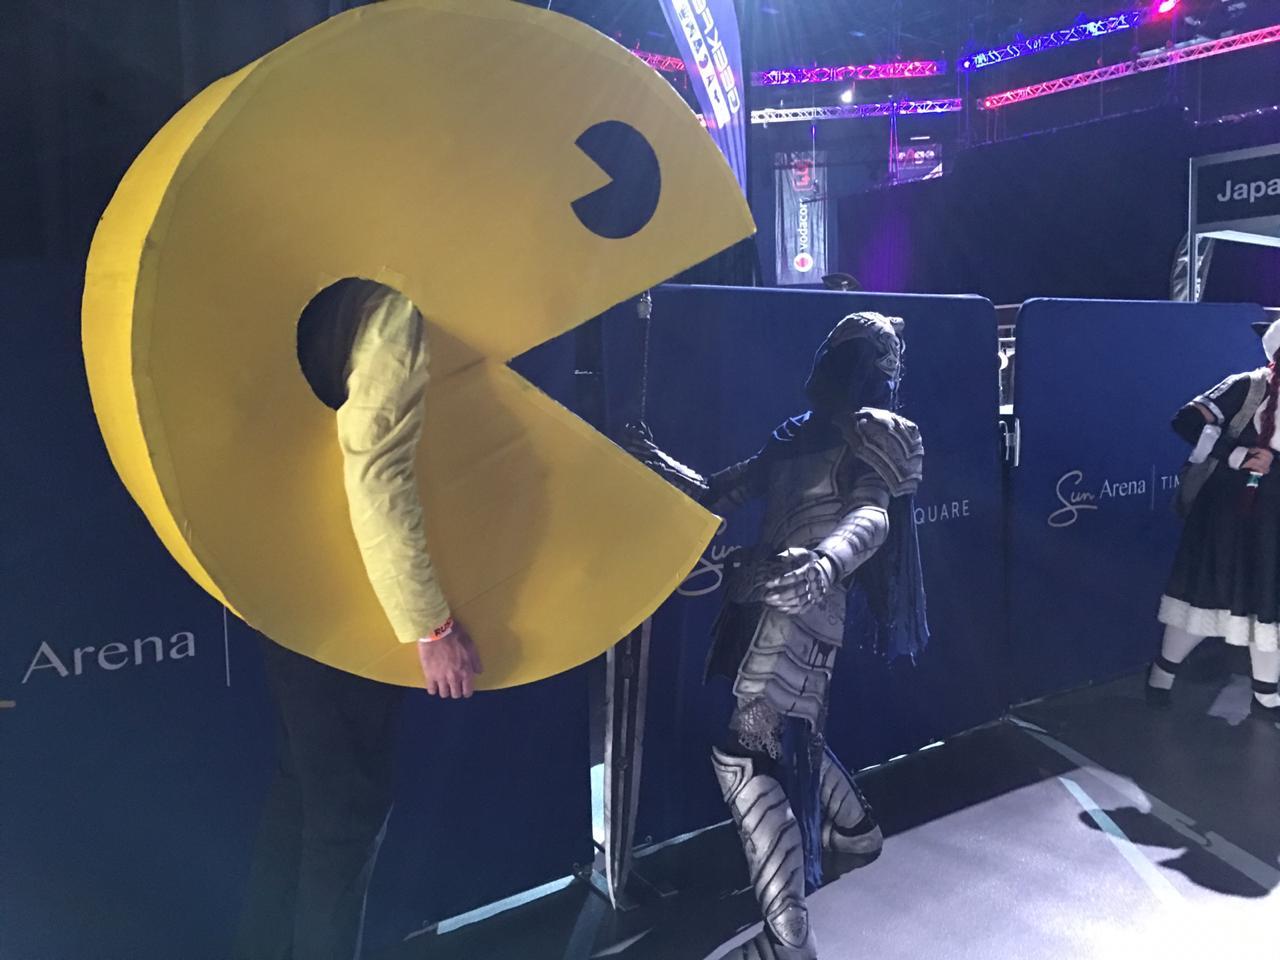 GeekFest Through the Eyes of Pac-Man